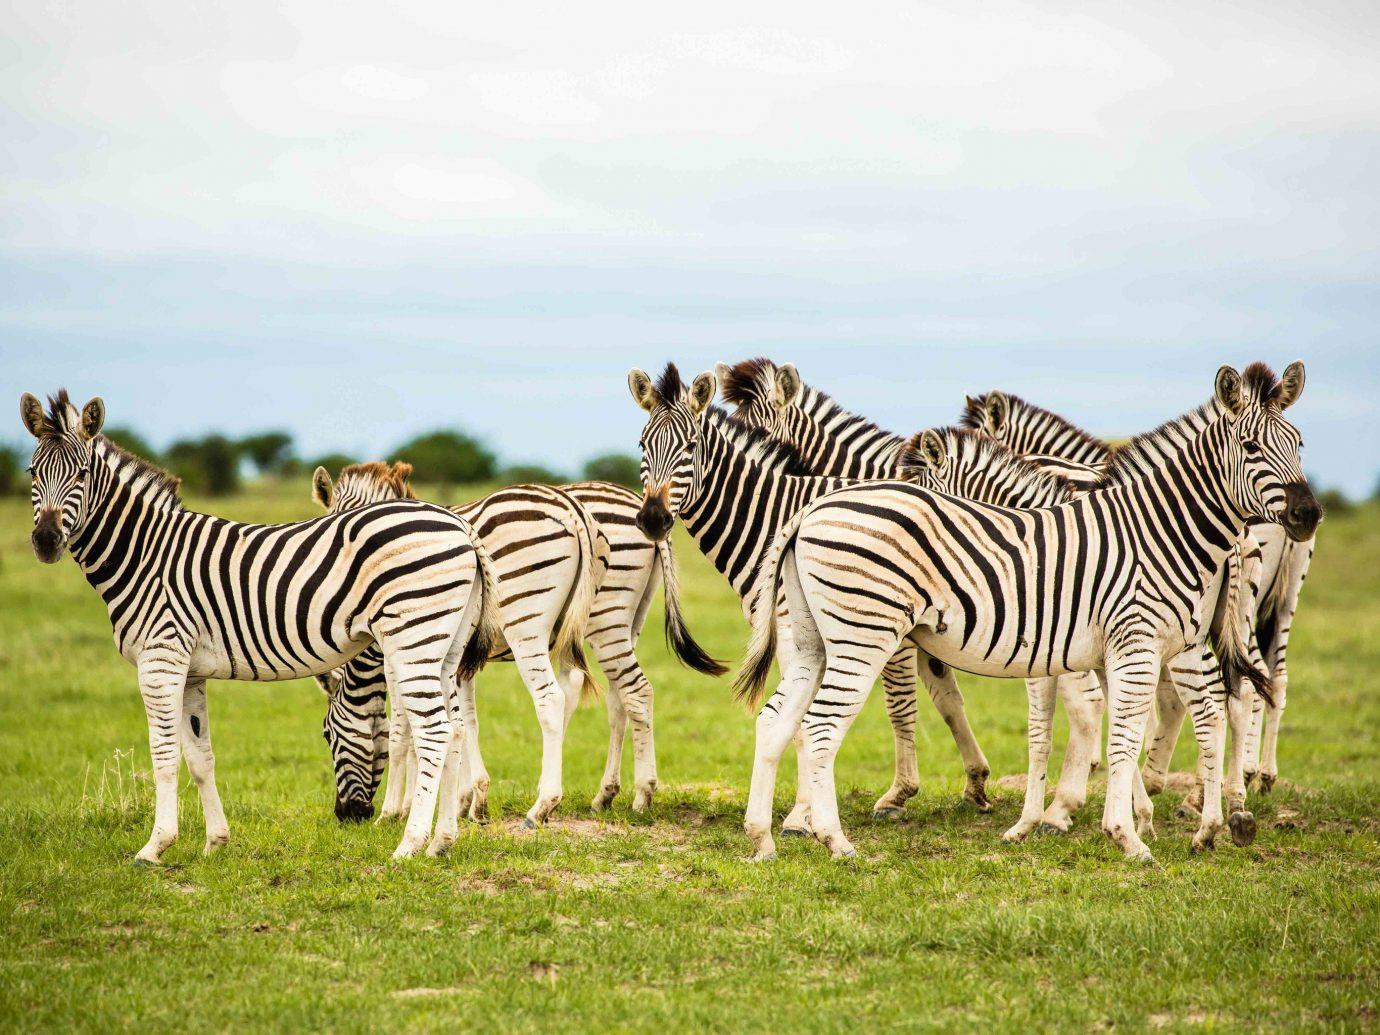 Outdoor Activities Trip Ideas grass zebra outdoor field sky Wildlife grassland mammal terrestrial animal animal ecosystem fauna savanna herd Safari grassy group grazing organism plain pasture quagga ecoregion horse like mammal lush giraffe